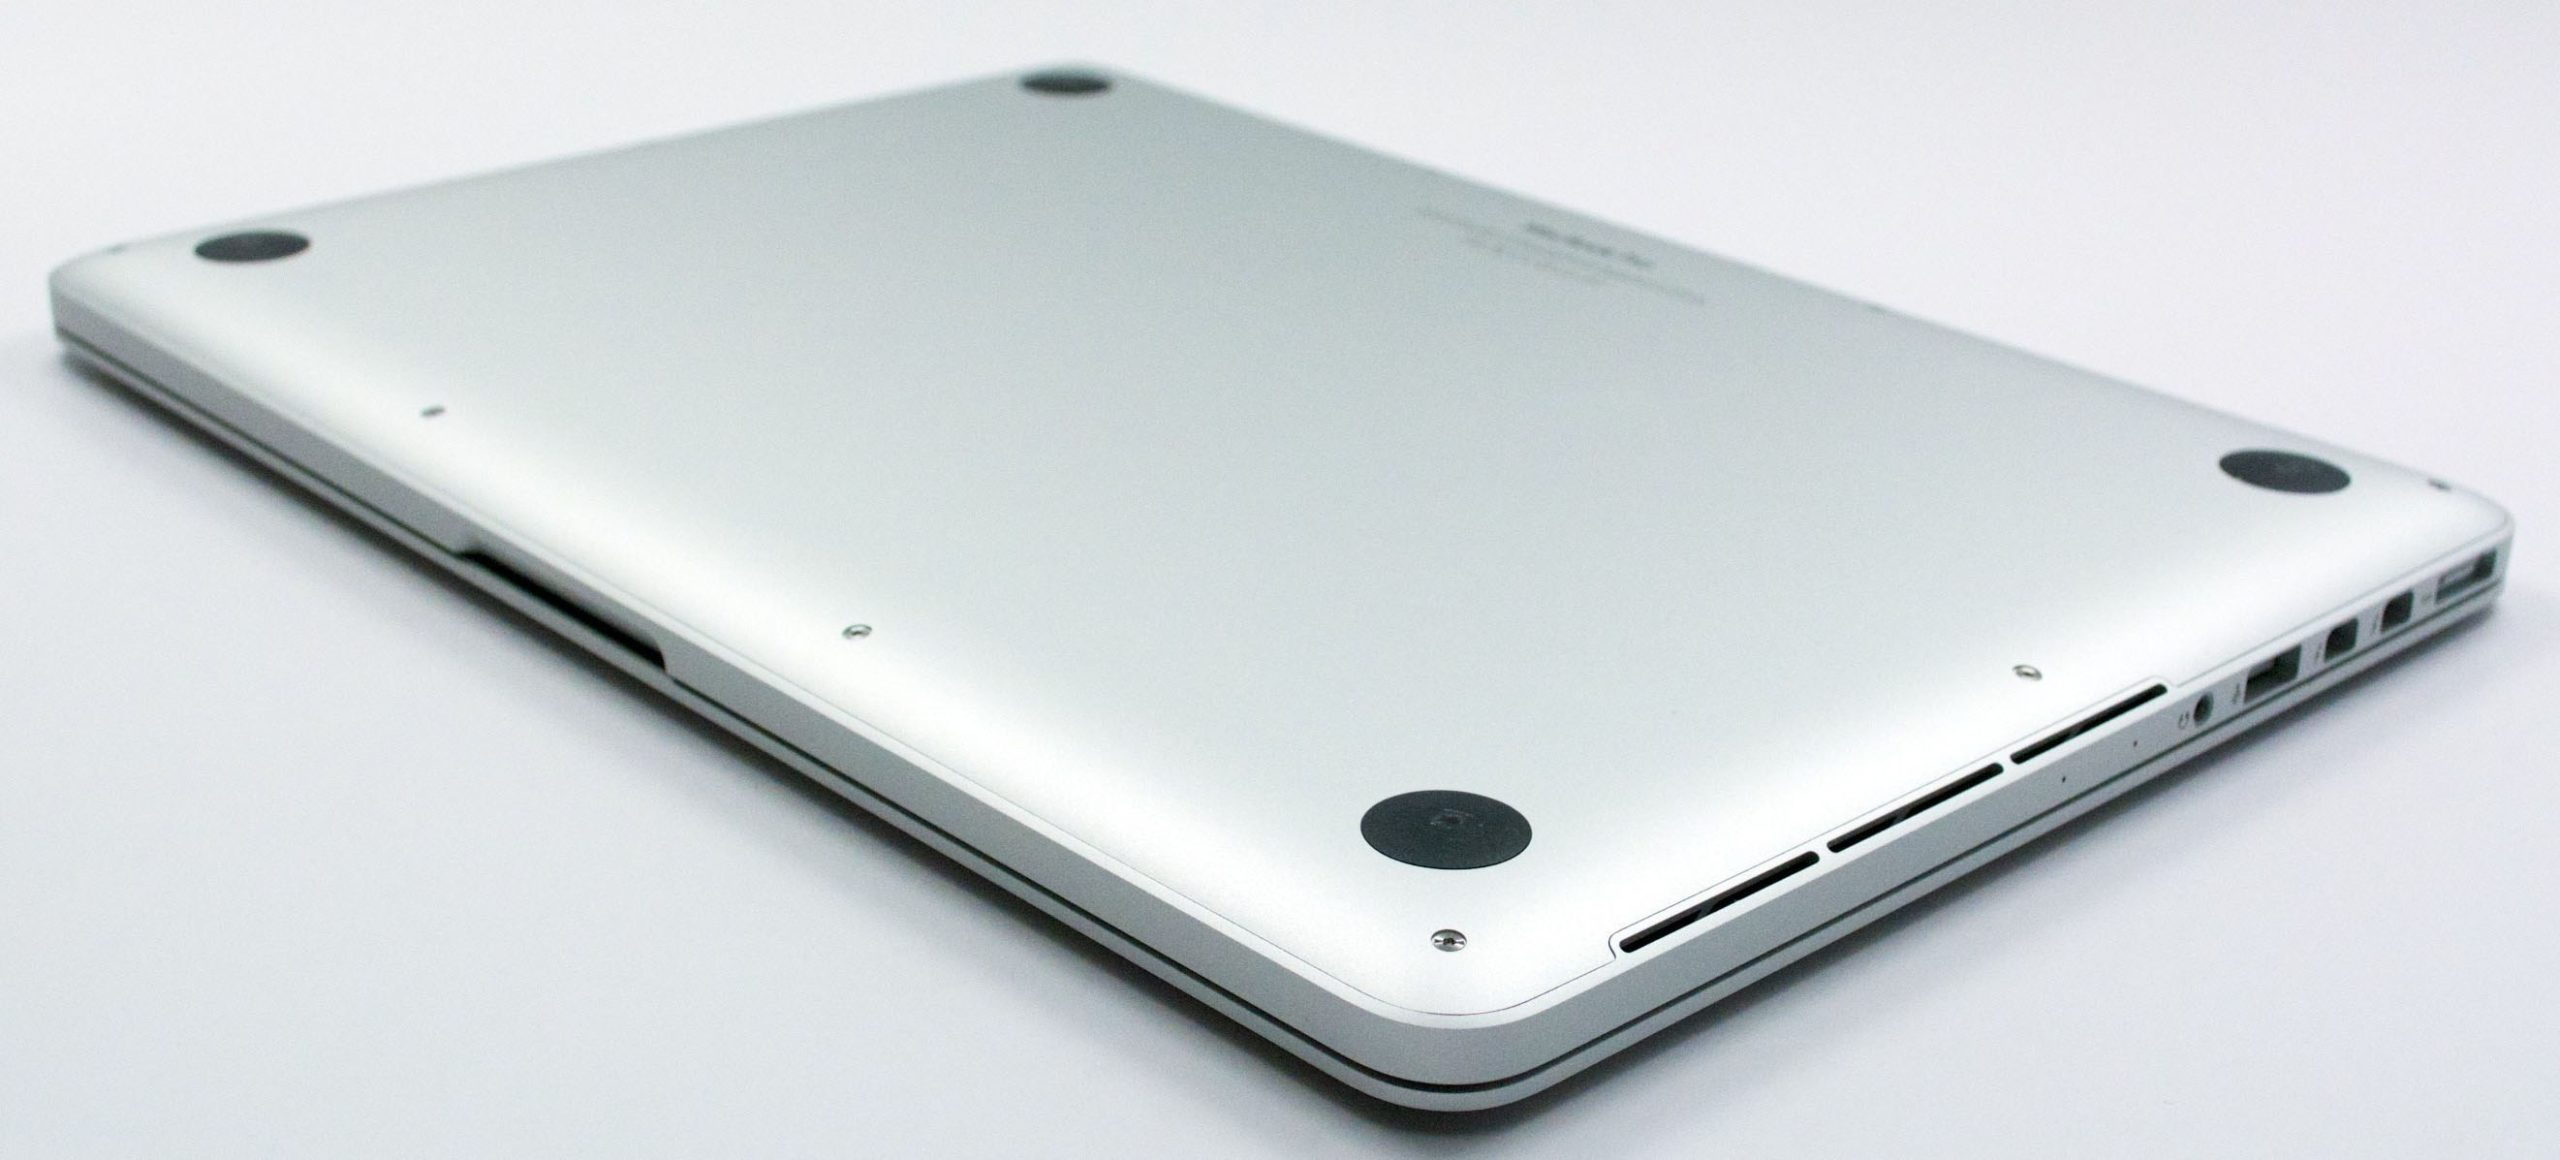 "Apple Macbook Pro Powerful 256GB SSD 8GB RAM 2013 Core i5 13.3"" A1502 Mac Laptop OS Catalina"